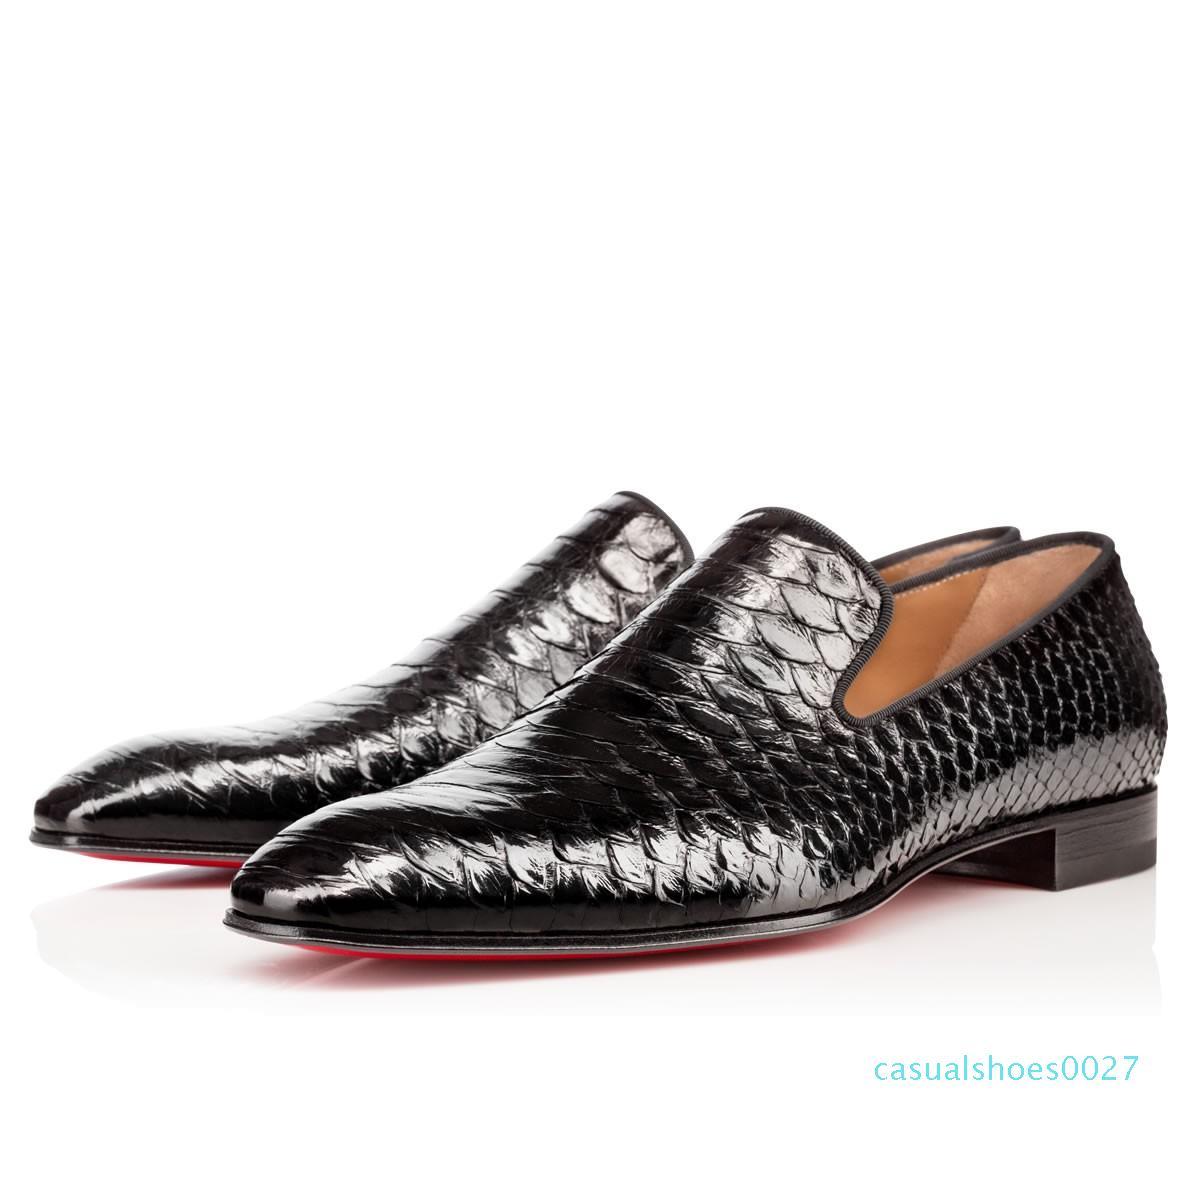 Marque Red Bottom Mocassins Luxury Wedding Party Chaussures Designer cuir verni noir Chaussures Robe Suede pour Slip Mens Flats